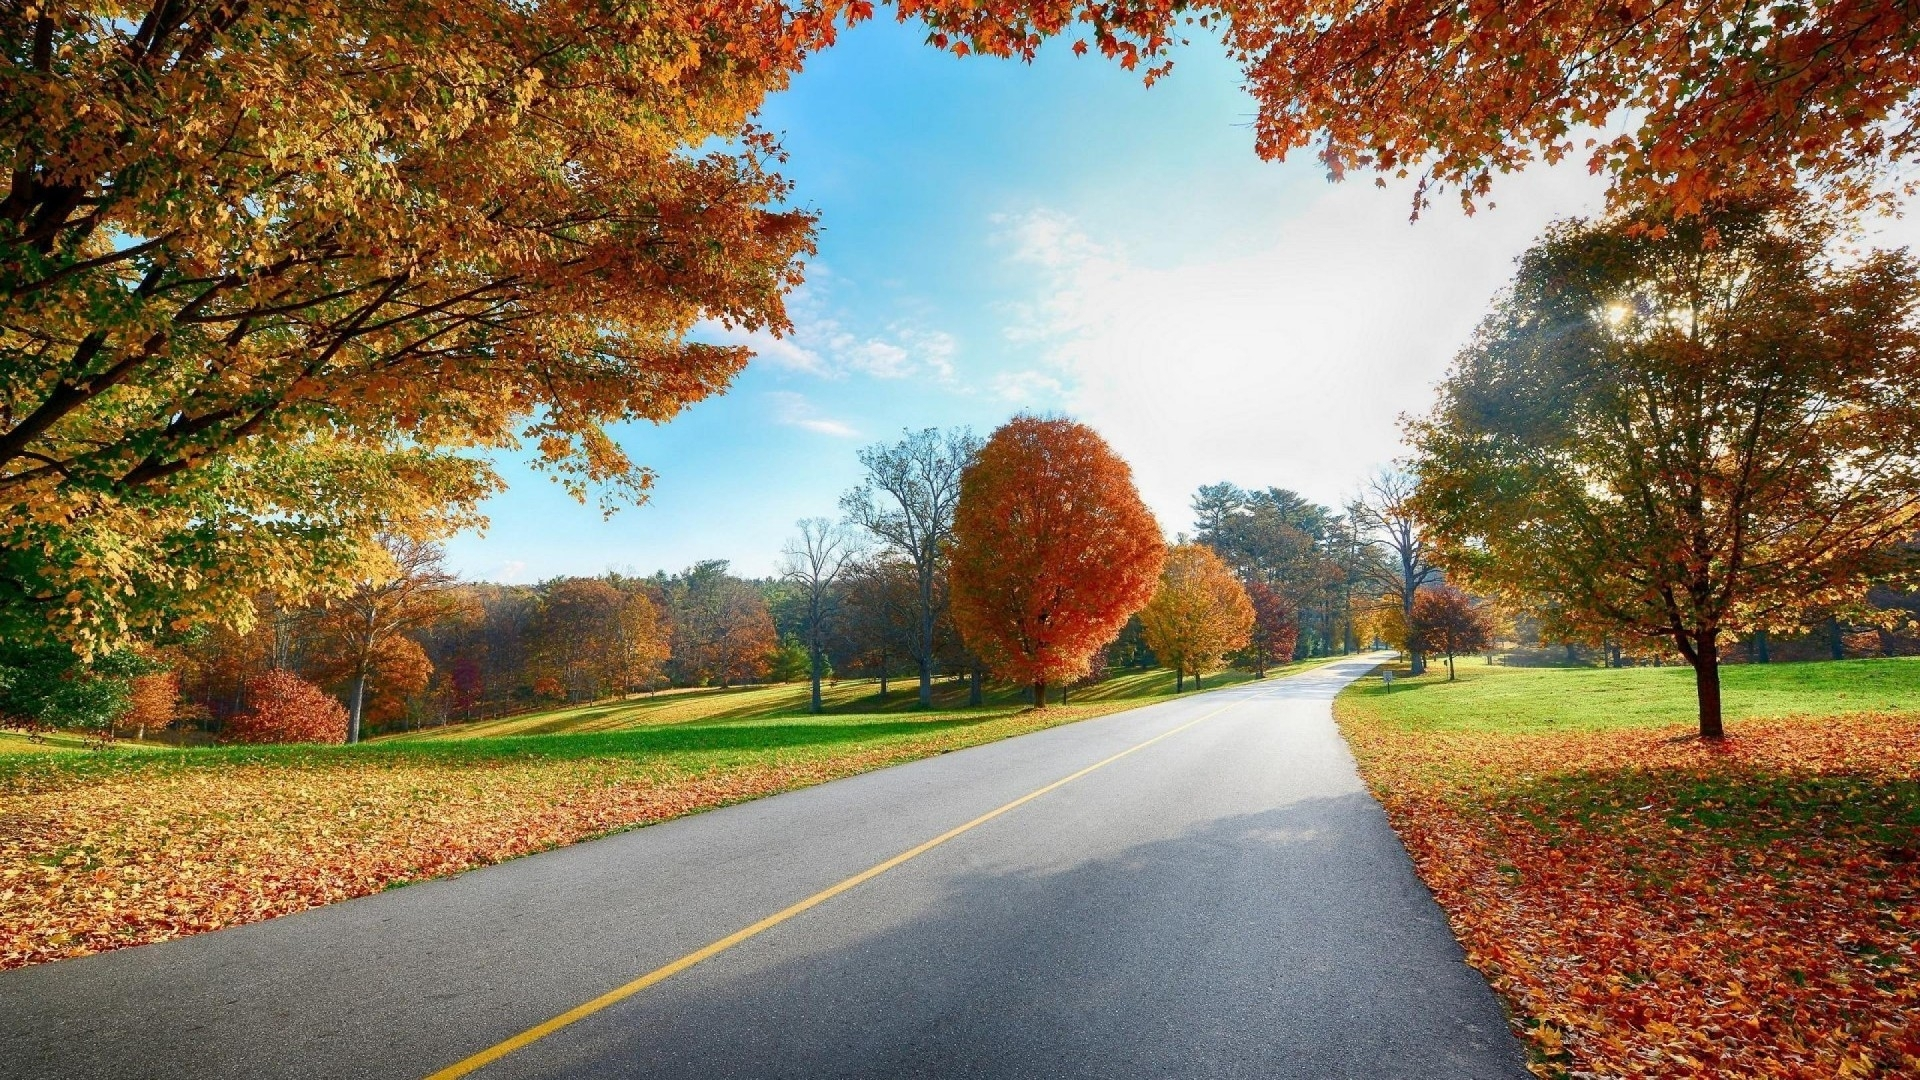 1080p hd image nature | pixelstalk